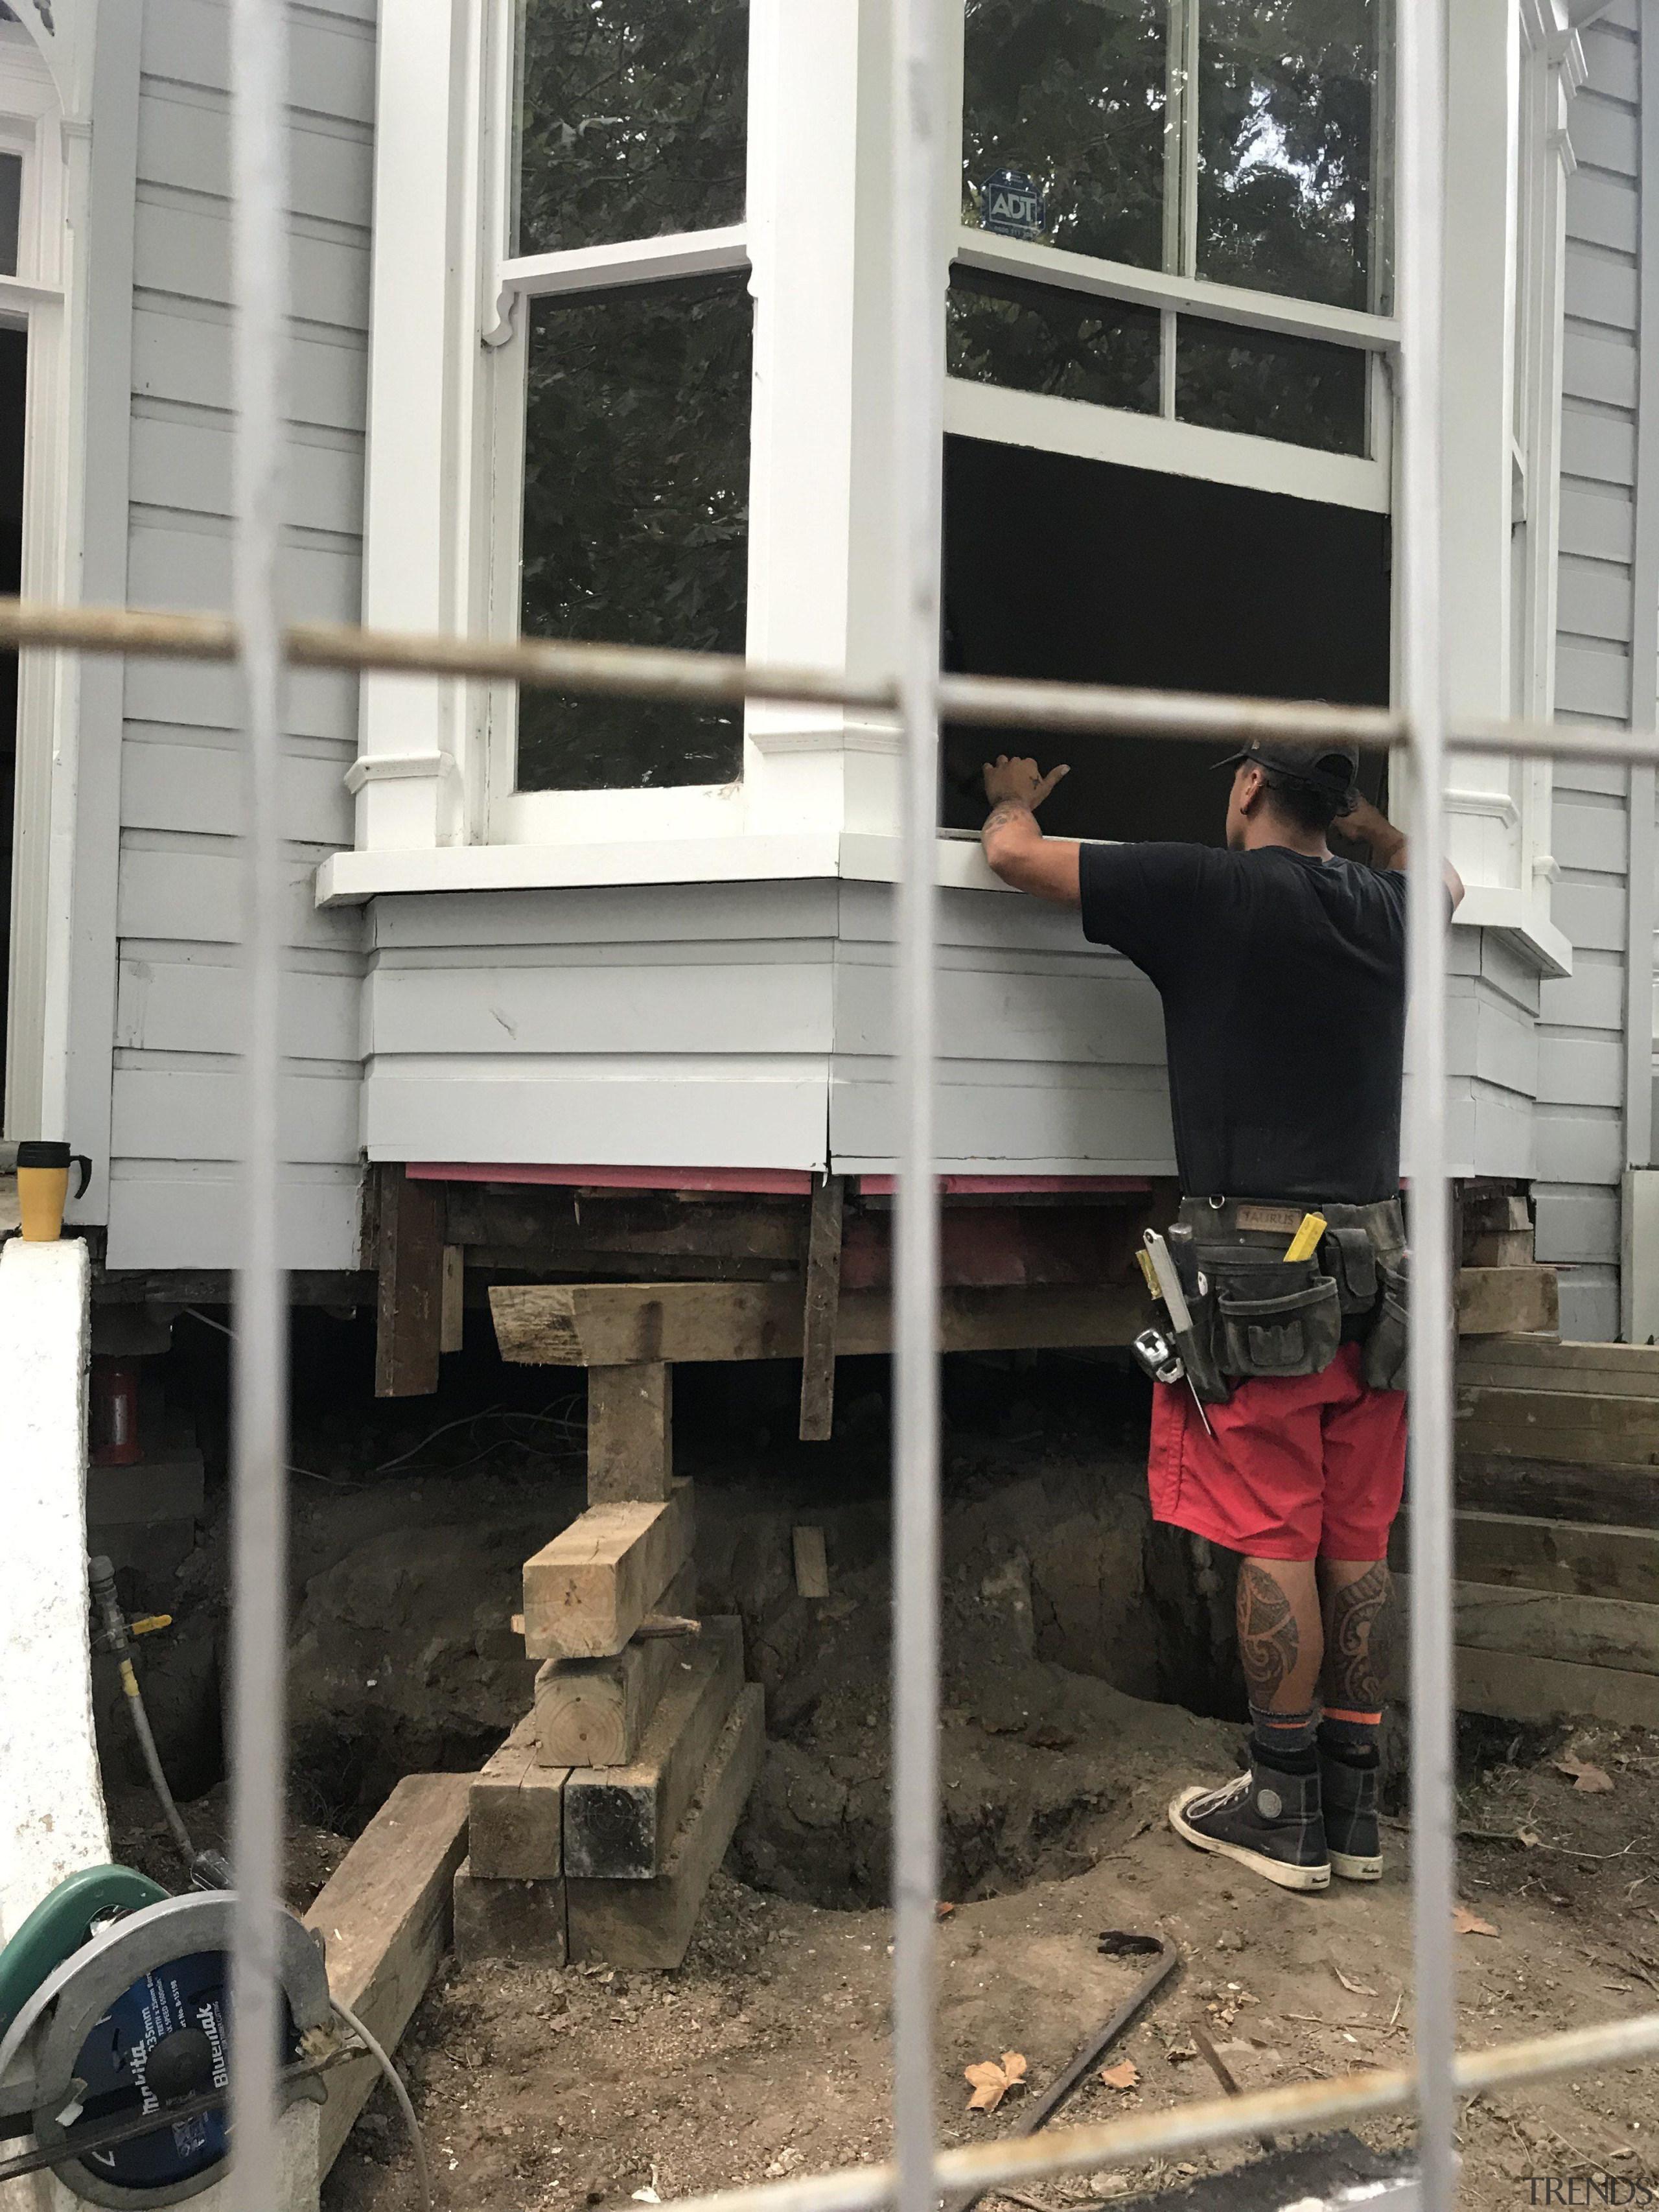 Diary of a renovation: Volume two - house house, window, black, white